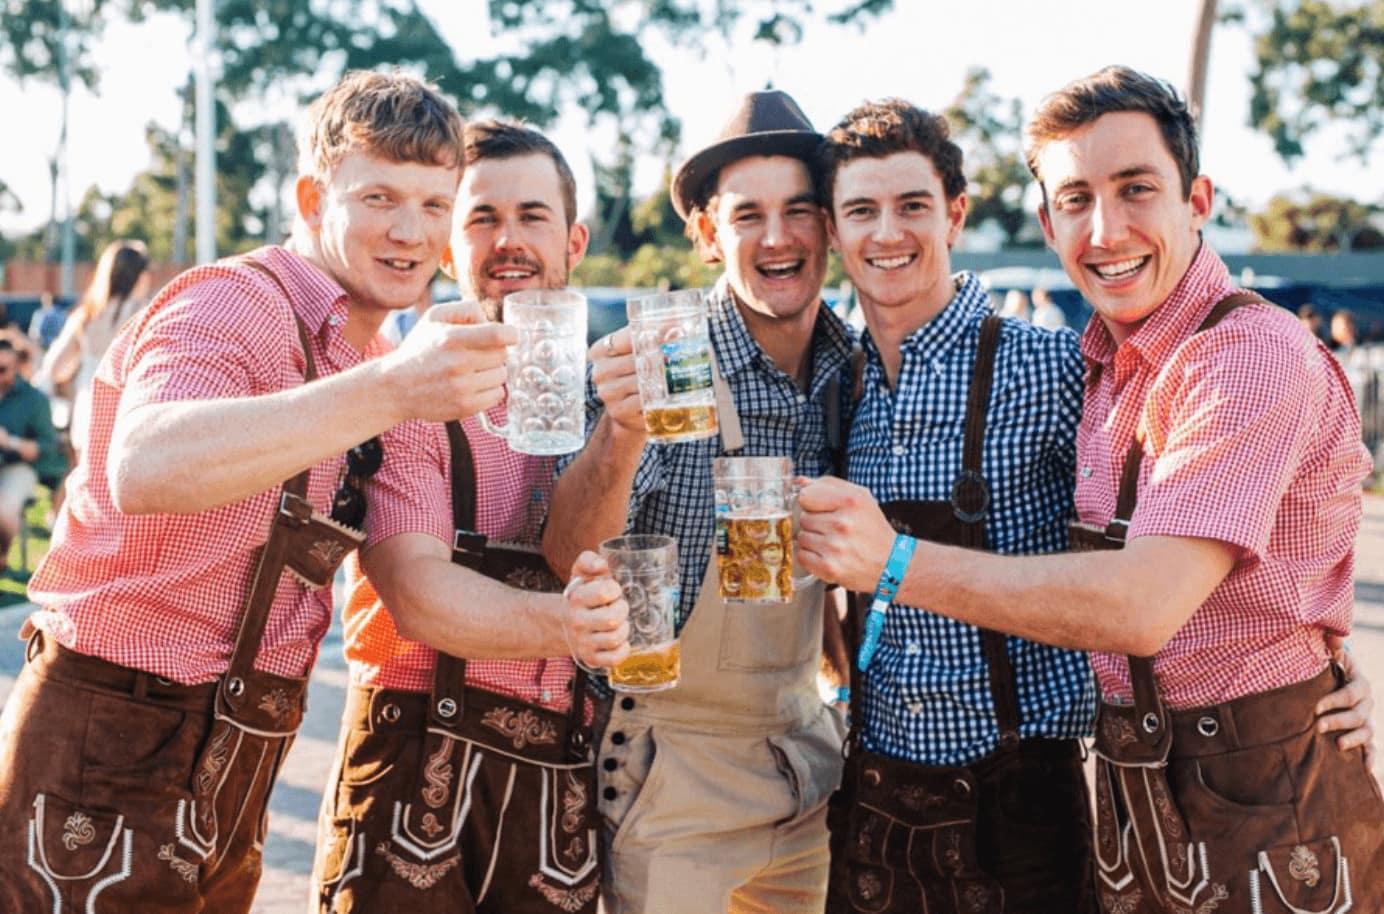 OKTOBERFEST 2019 OUIPLEASE HOMME MEN'S LIFESTYLE BLOGPOST